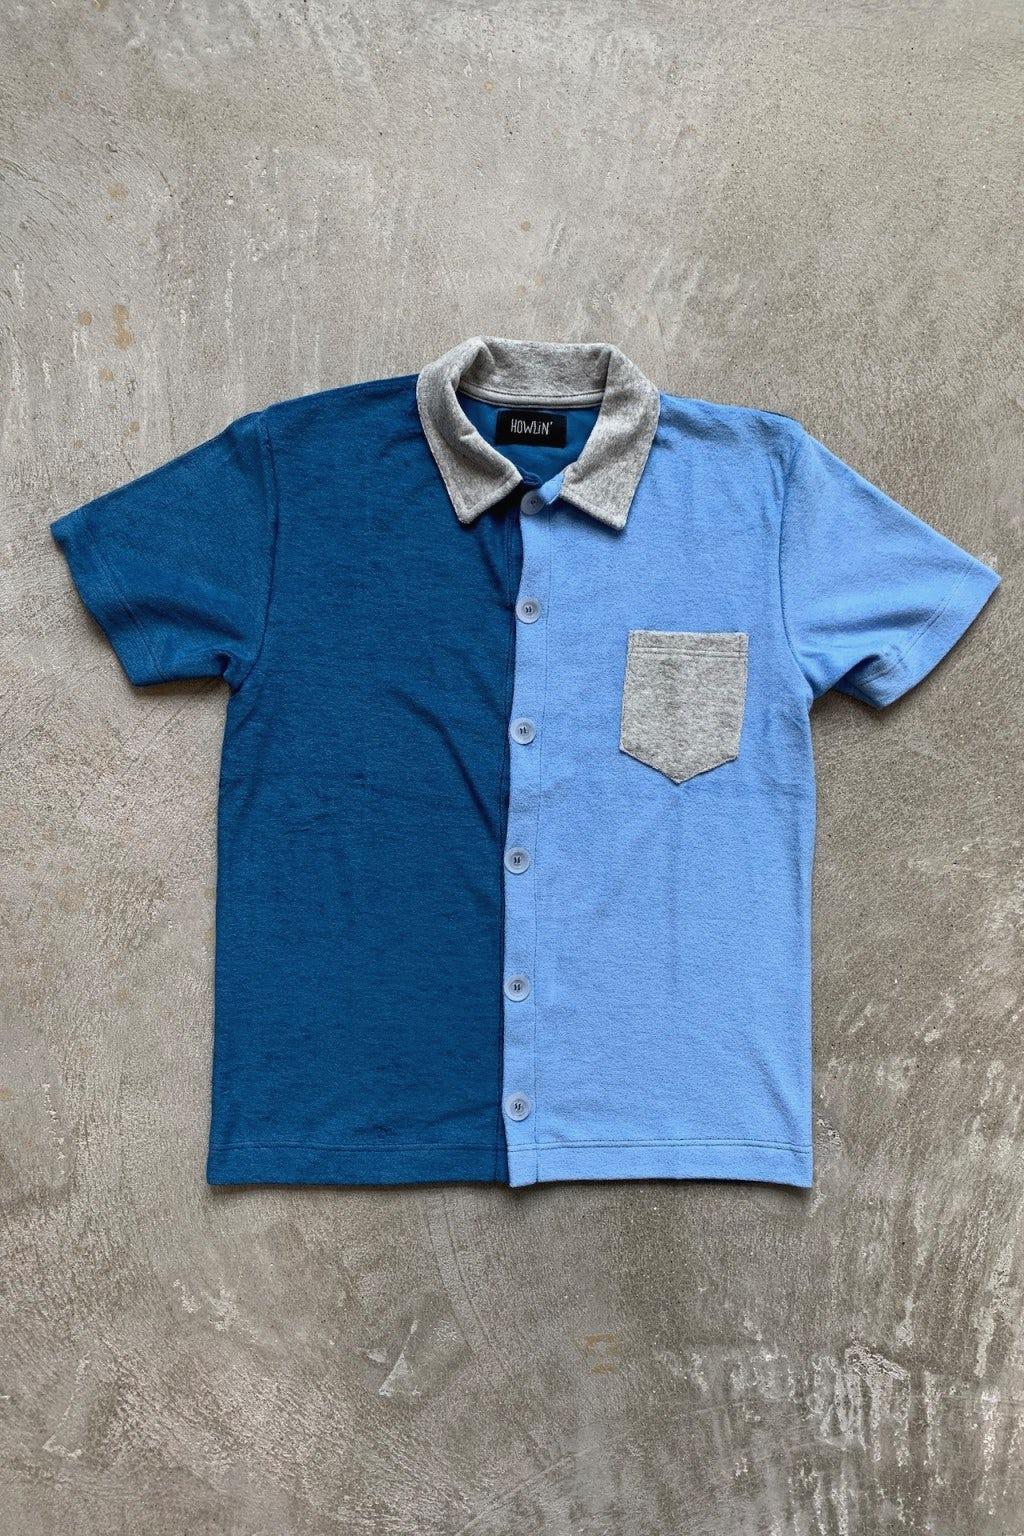 Howlin' Crystal Clear Shirt Ocean Blue